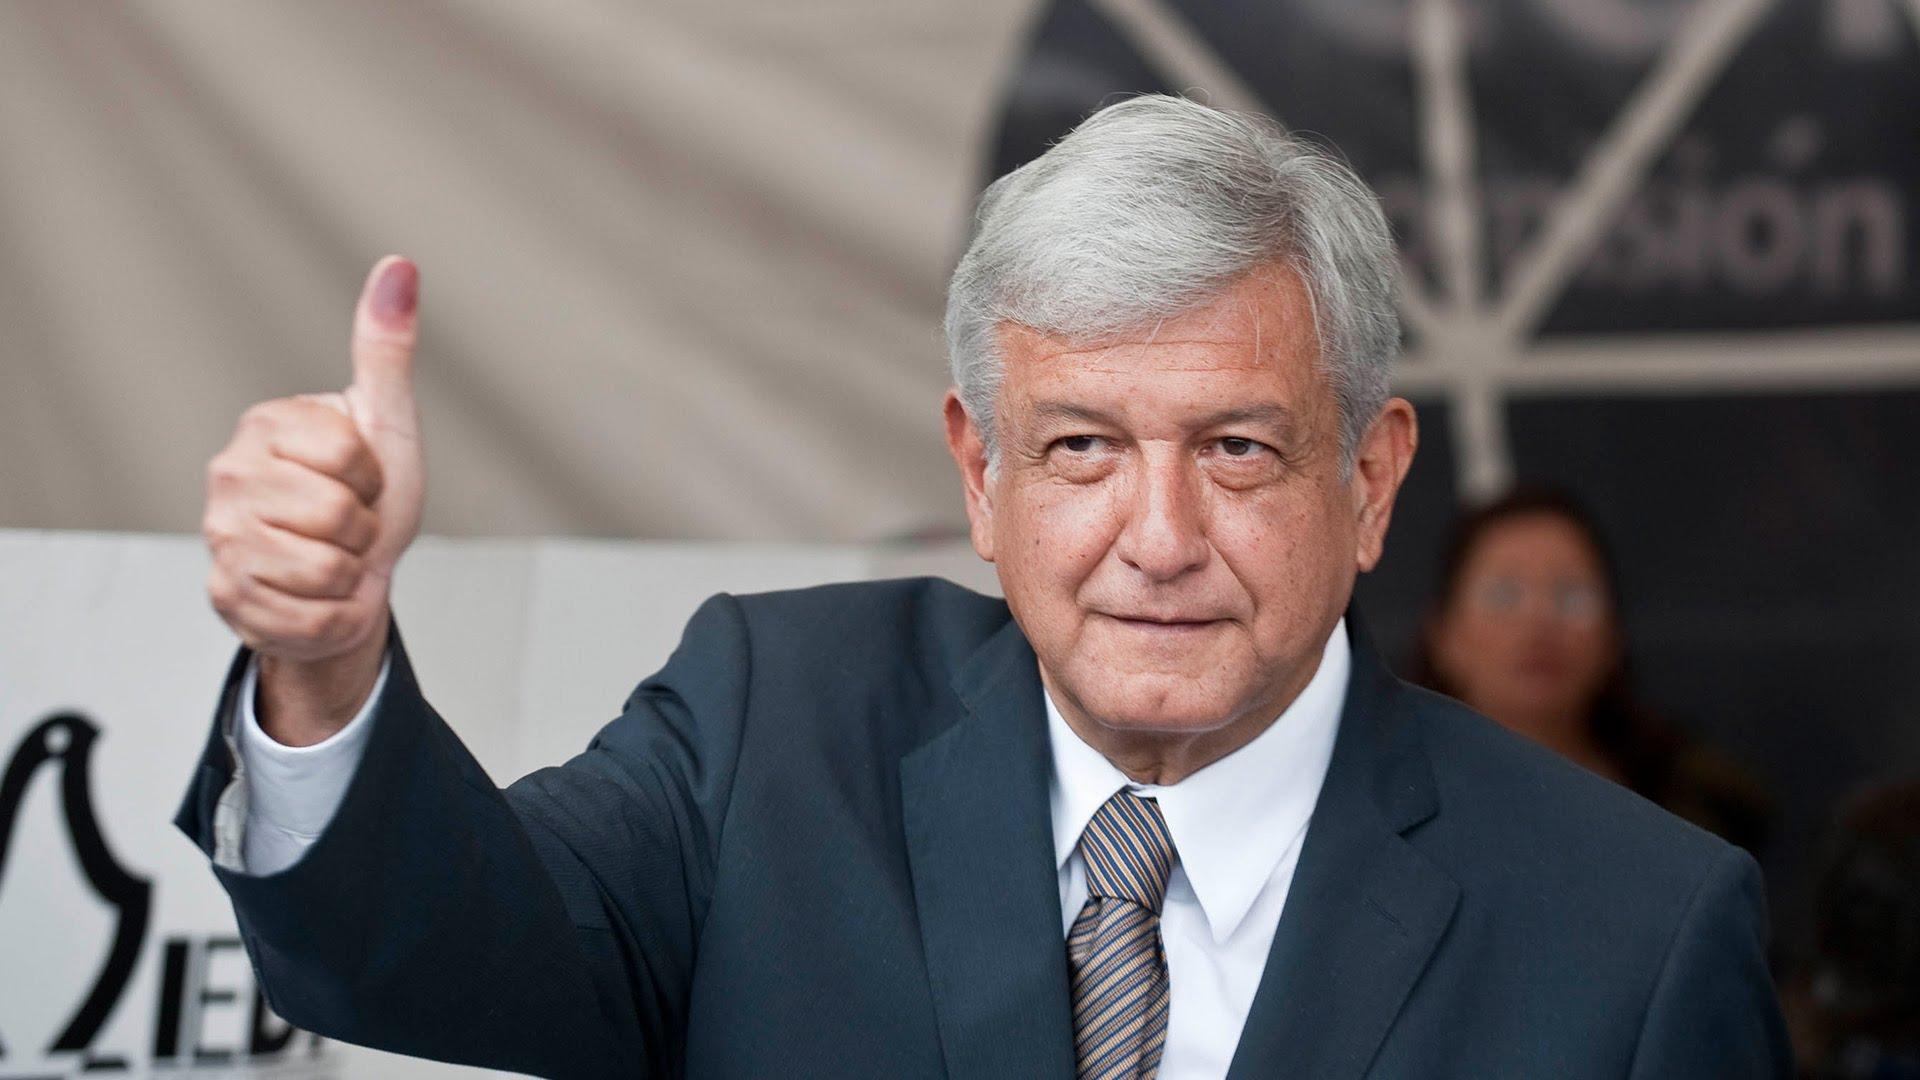 Andrés Manuel López Obrador Άντρες Μανουέλ Λόπες Ομπραδόρ